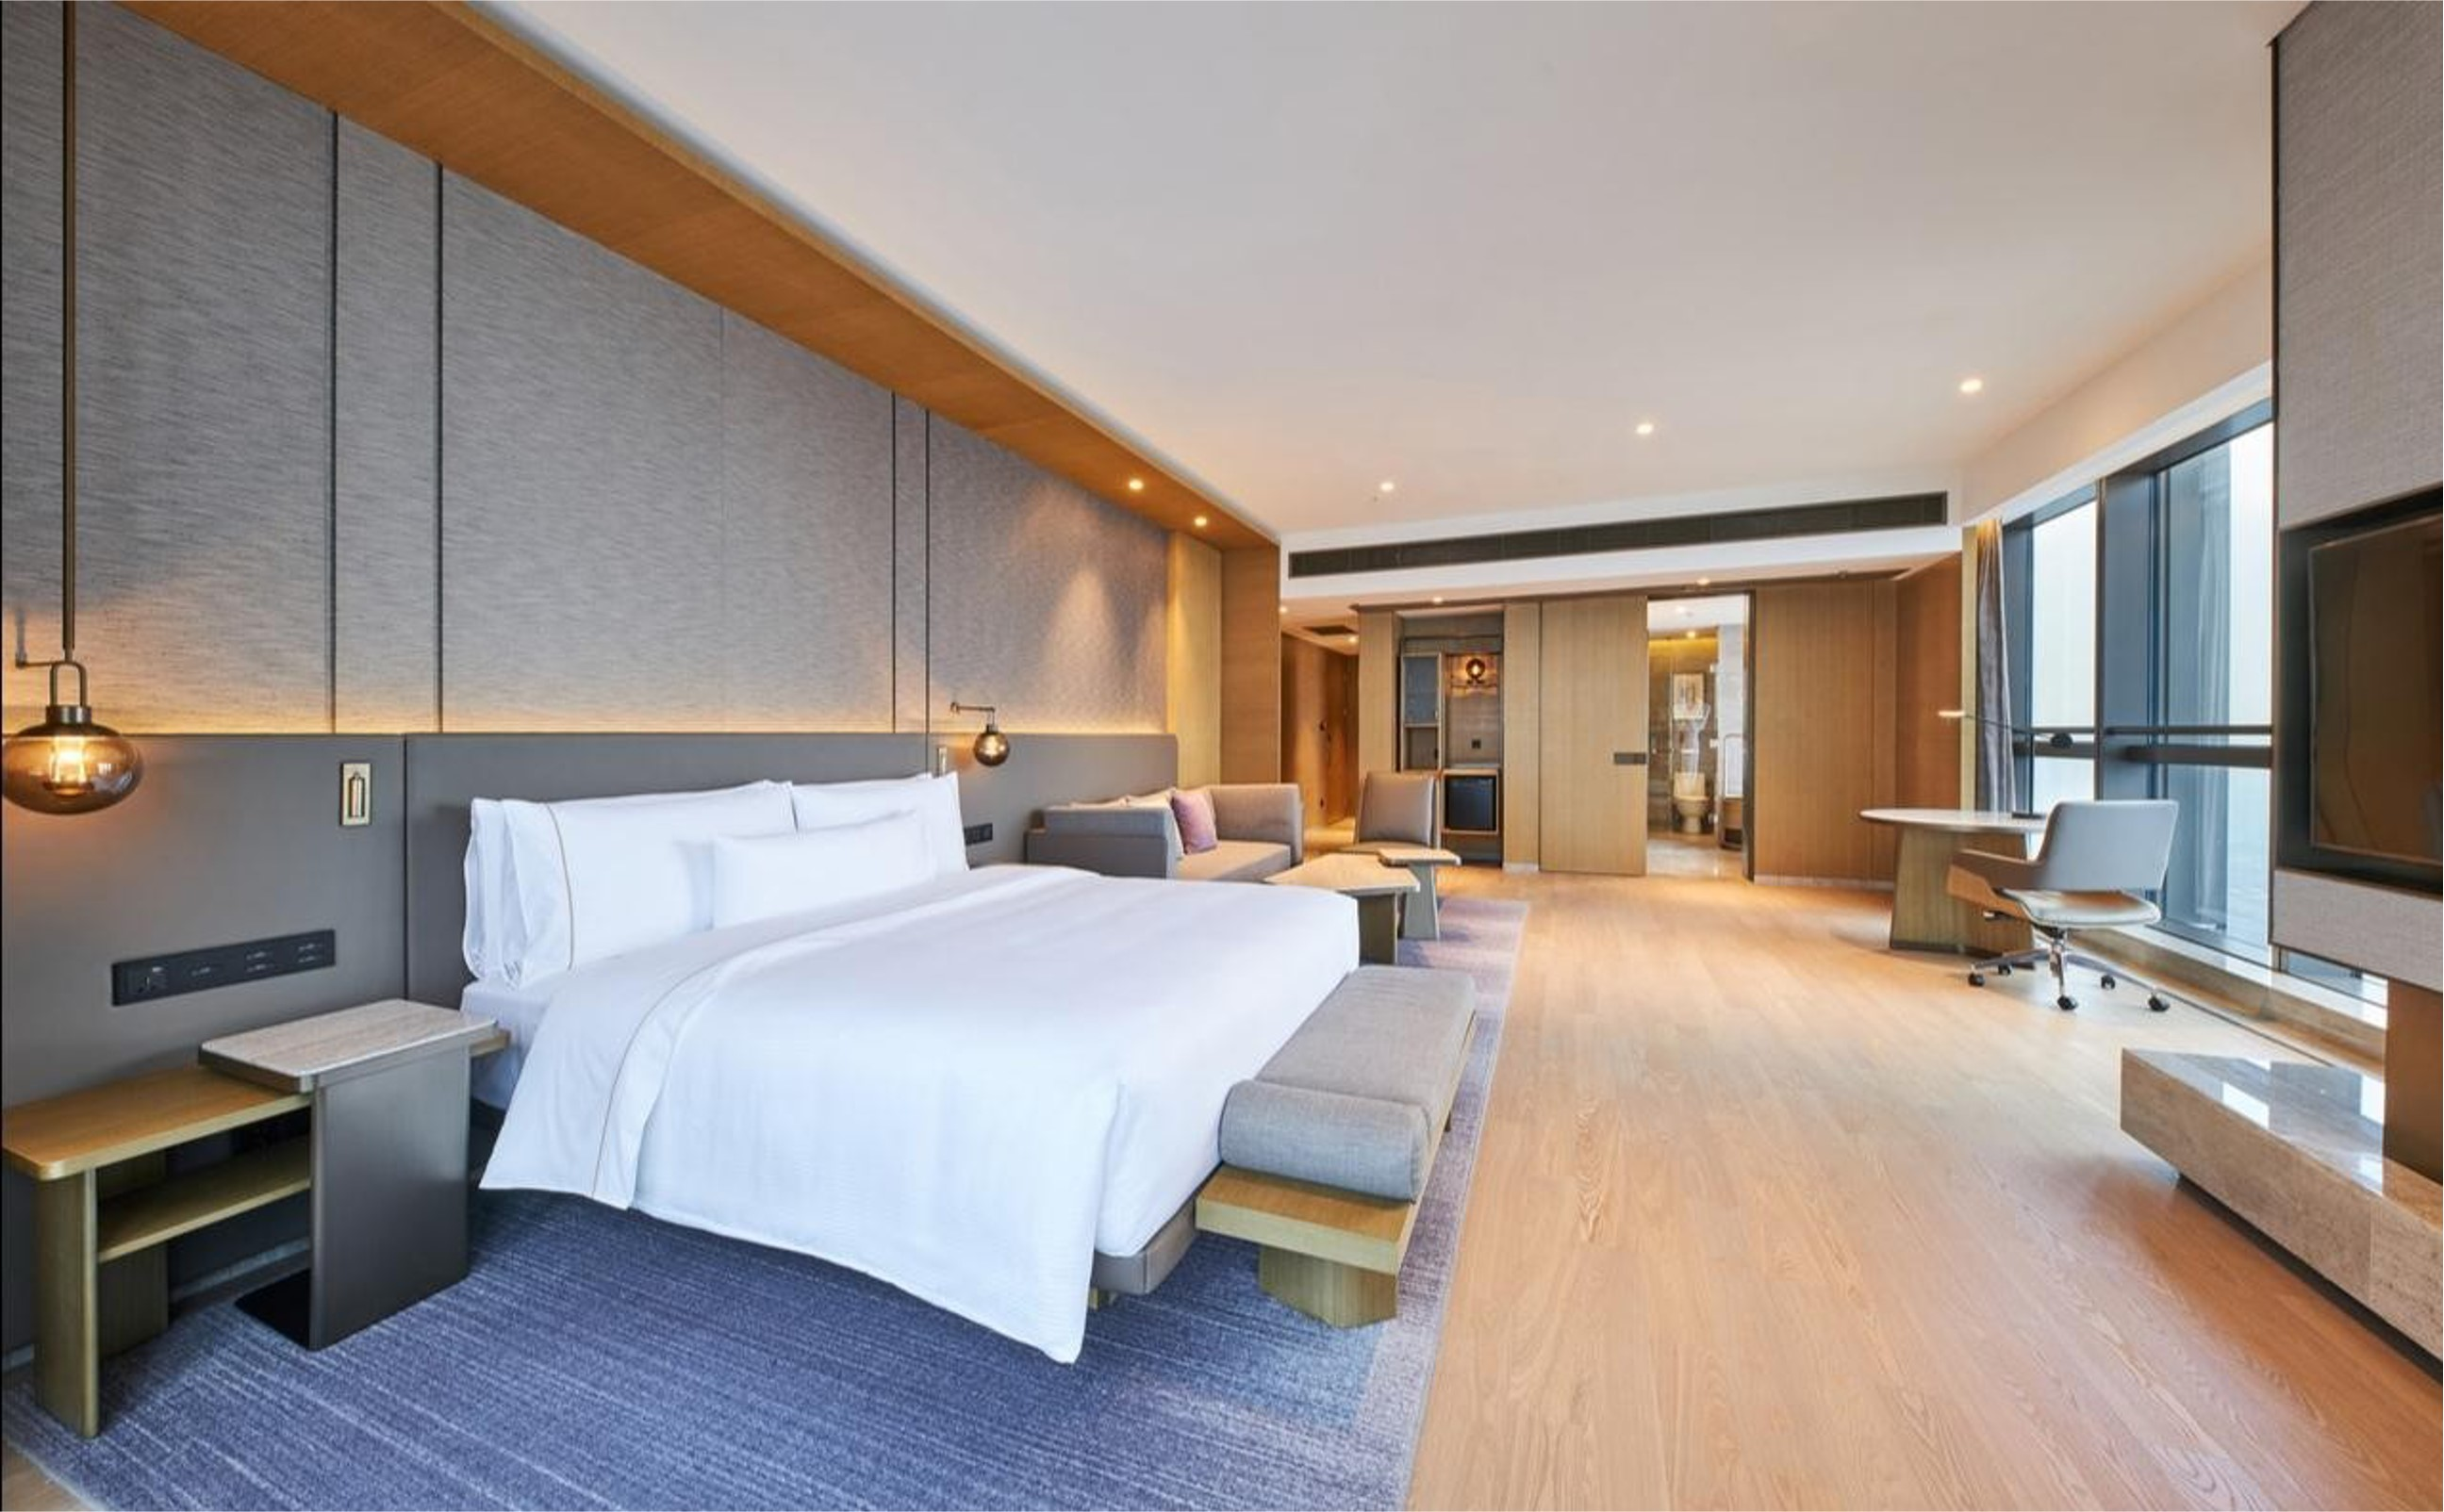 Gojo furniure area01 hotel furniture manufacturers manufacturers for guest room-1